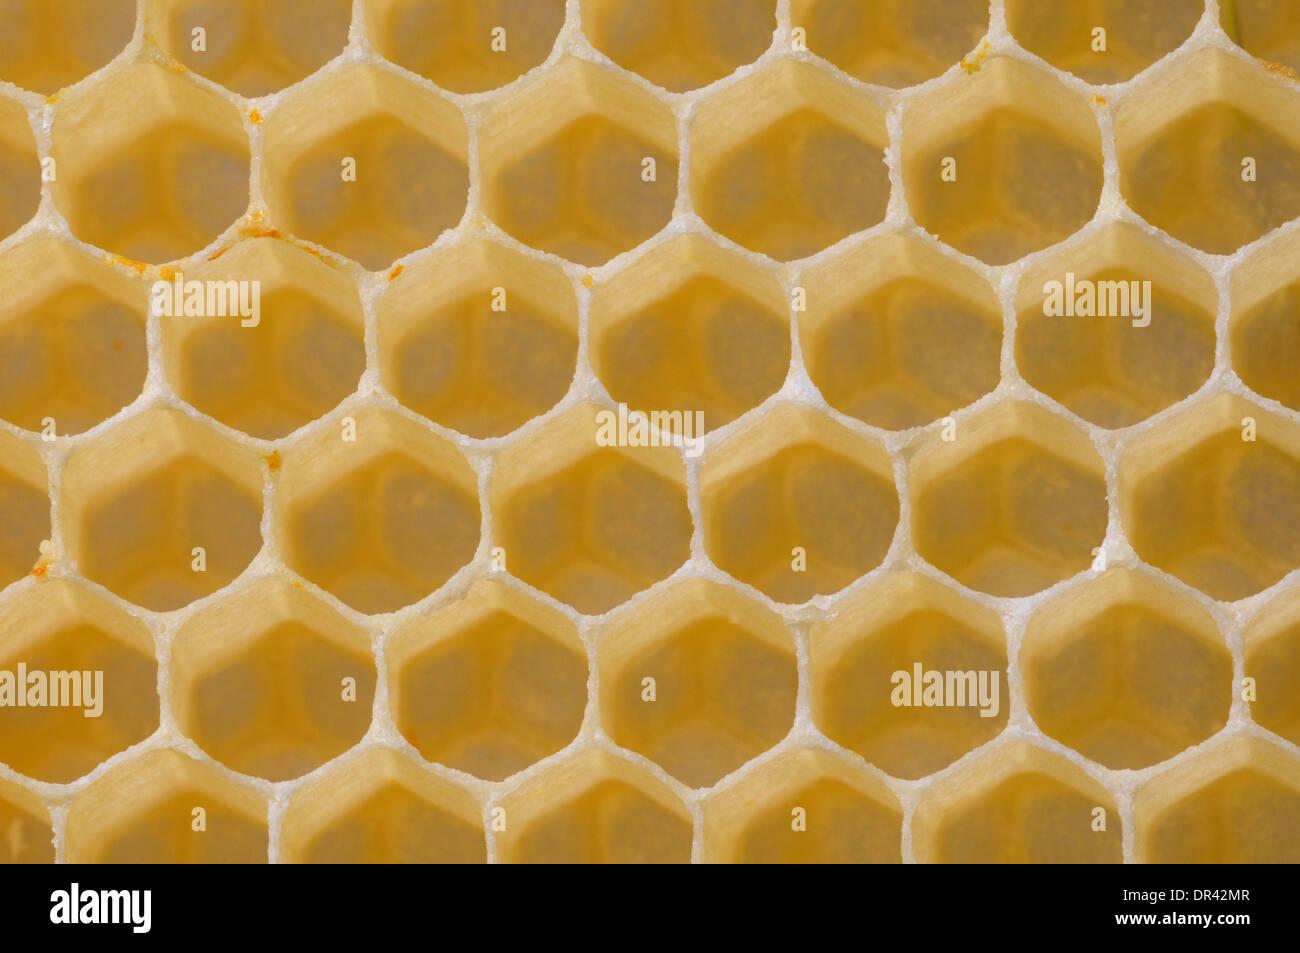 Wax honeycomb hexagonal cells, made by honeybees, Apis mellifera to store honey - Stock Image